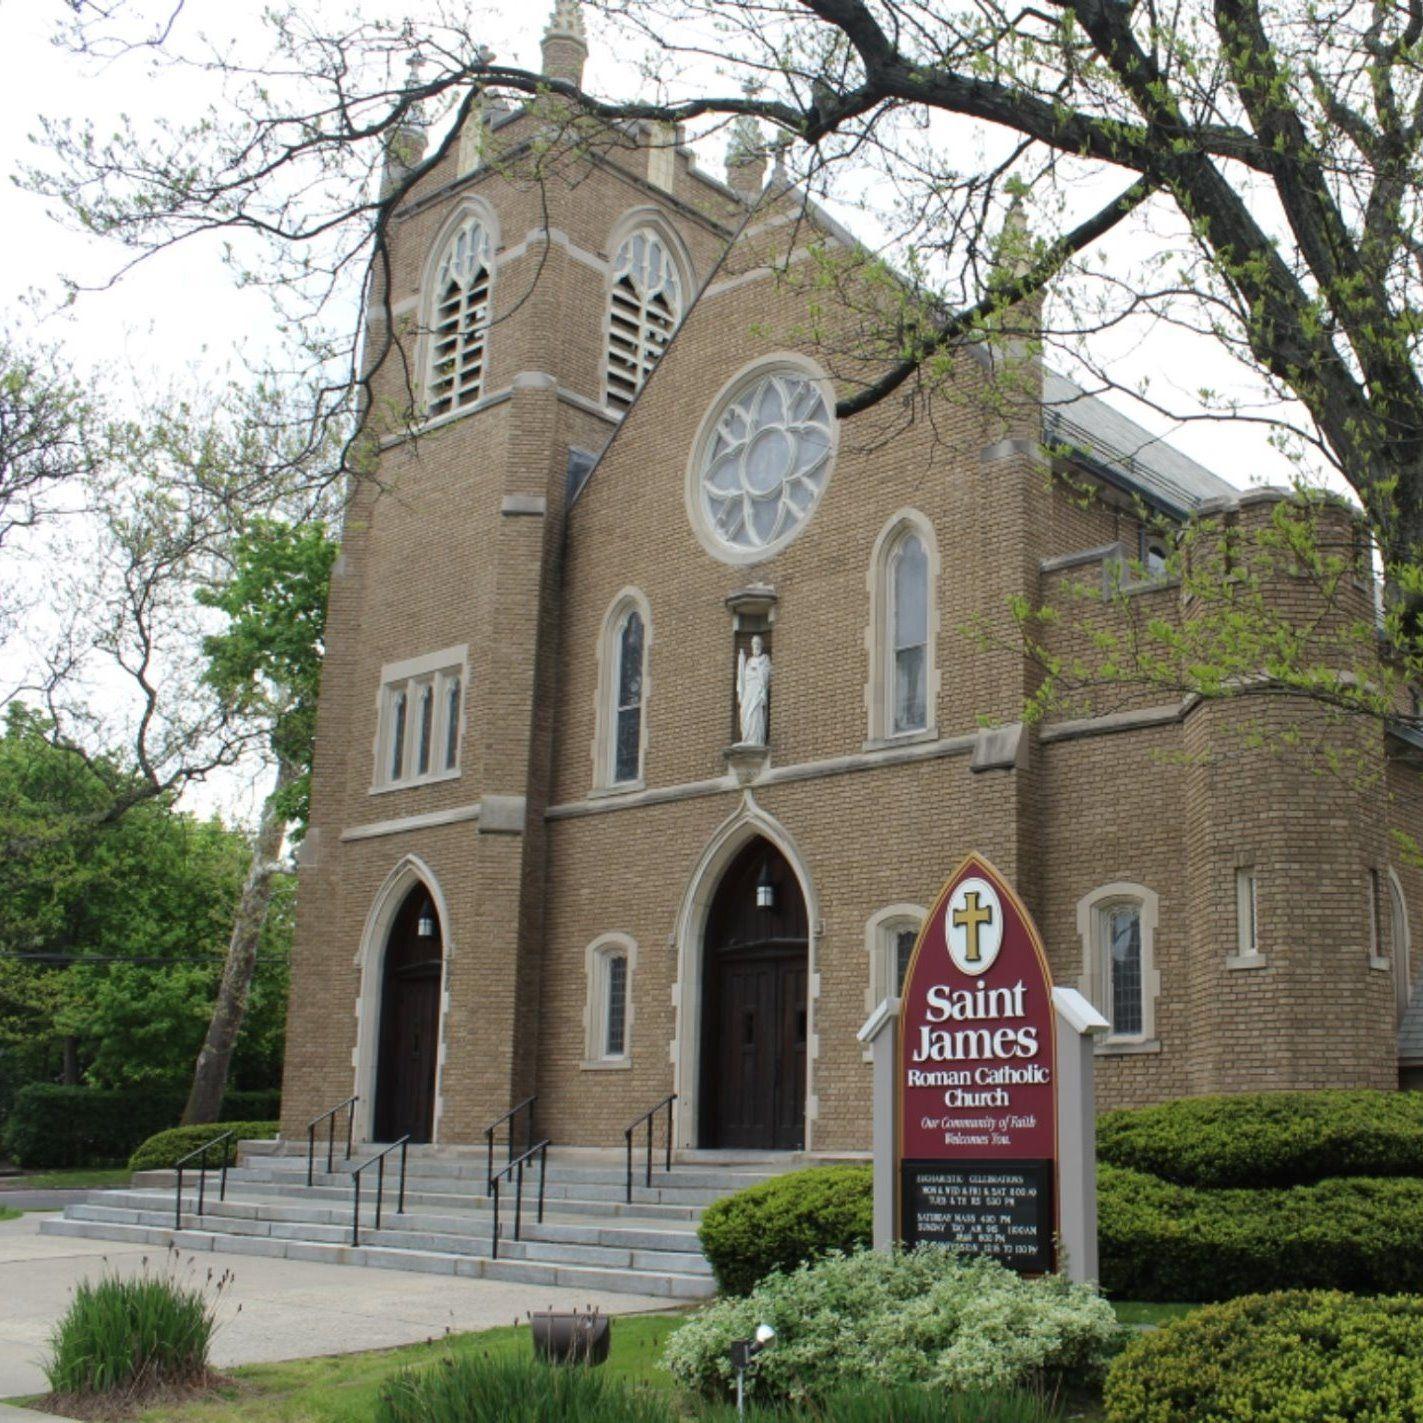 Saint James Roman Catholic Church - Food Pantry